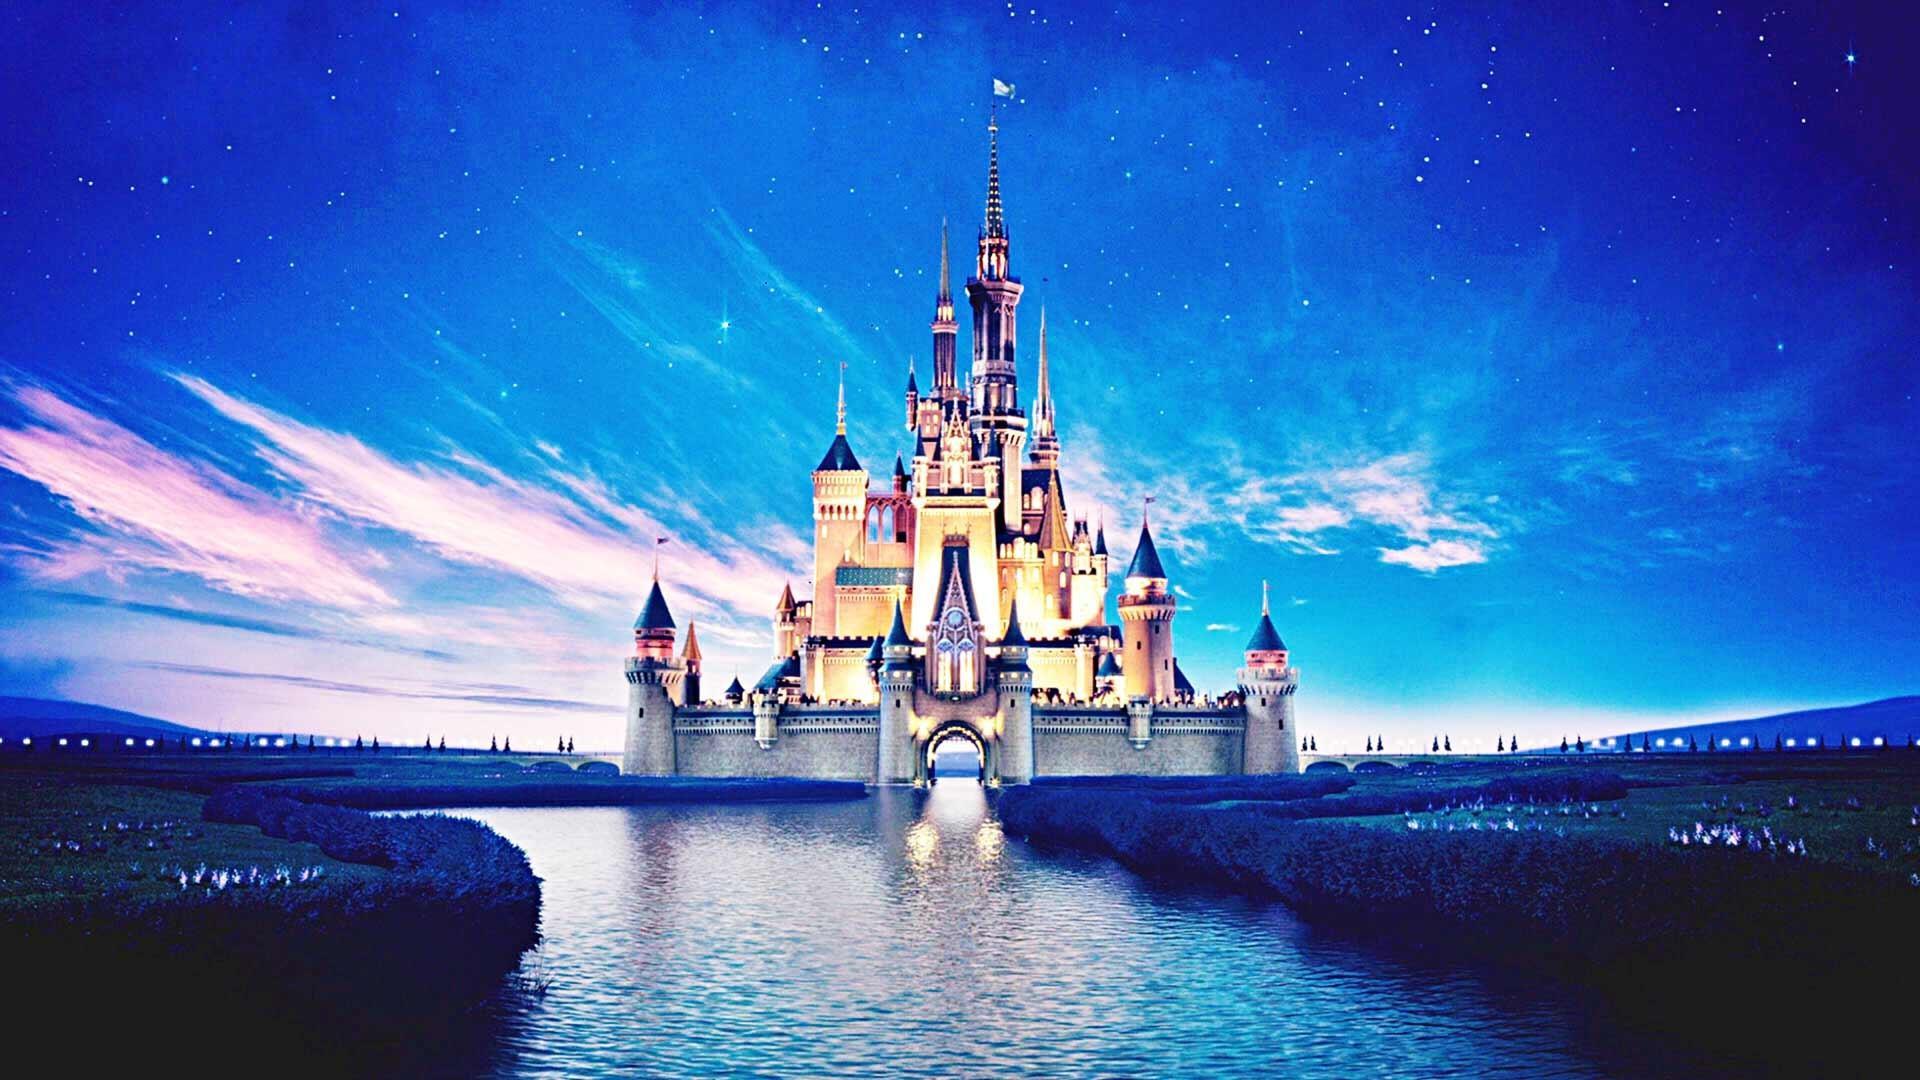 Trailer Trash! – Disney Dump!